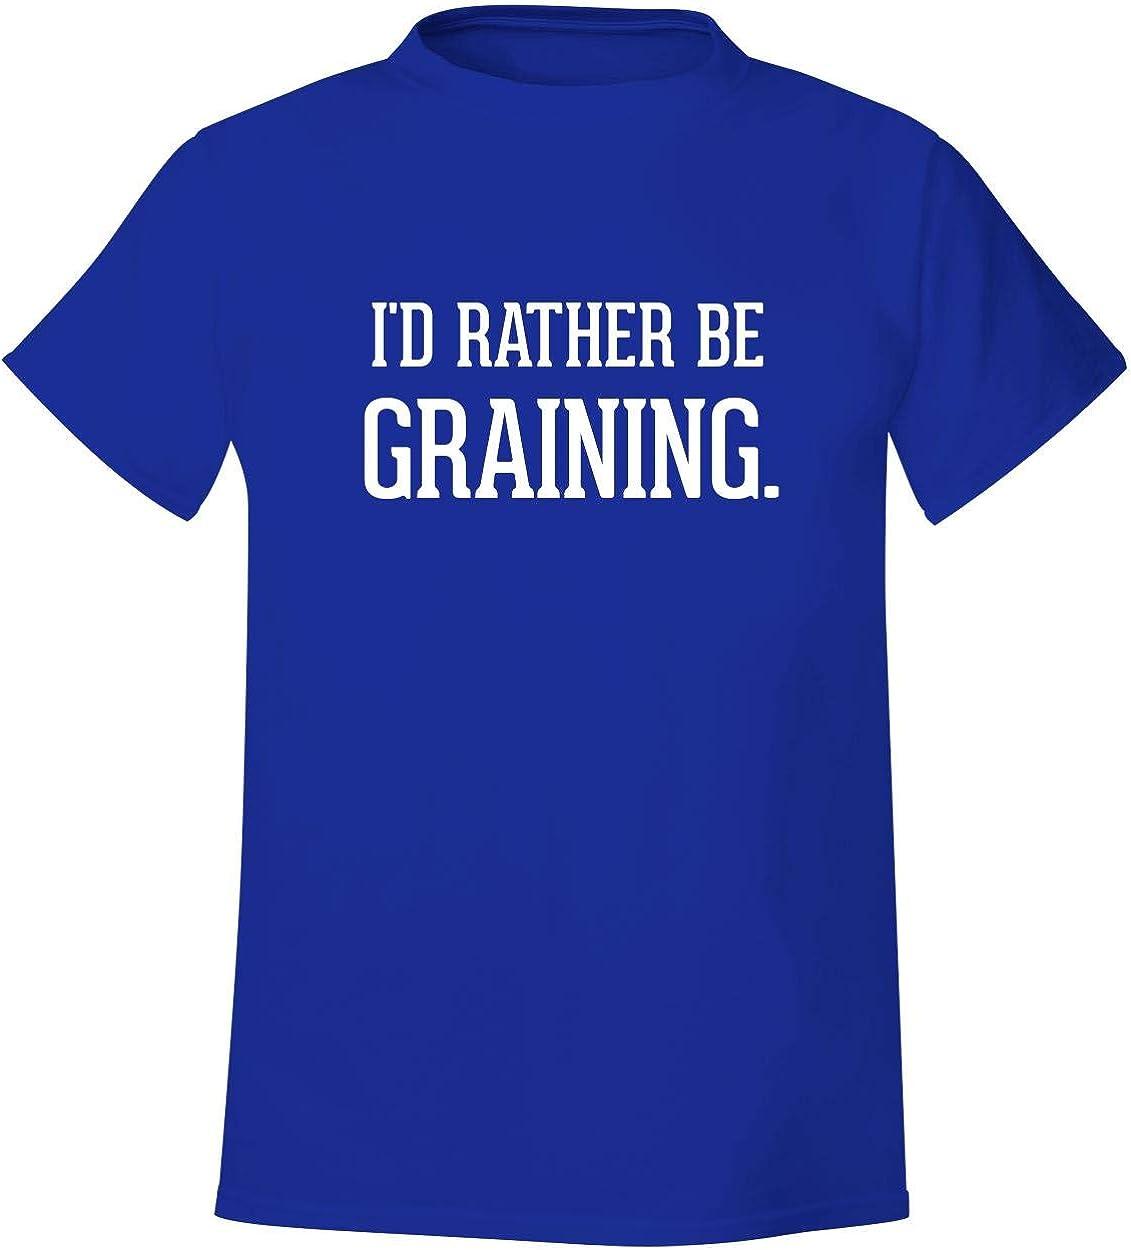 I'd Rather Be GRAINING. - Men's Soft & Comfortable T-Shirt